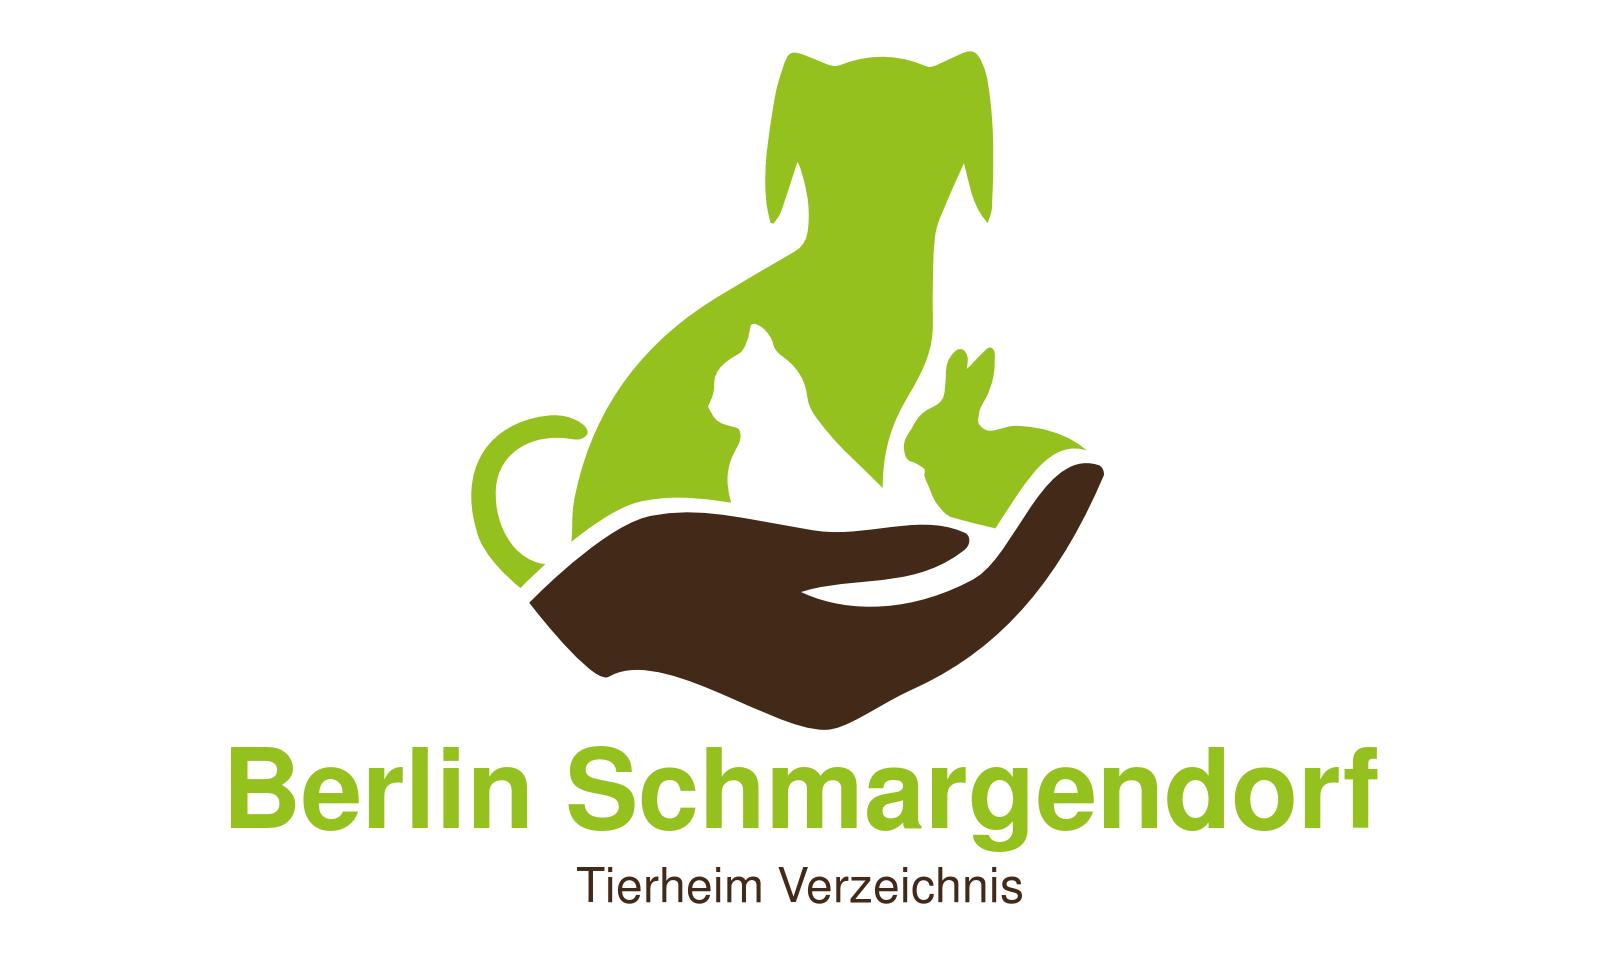 Tierheim Berlin Schmargendorf